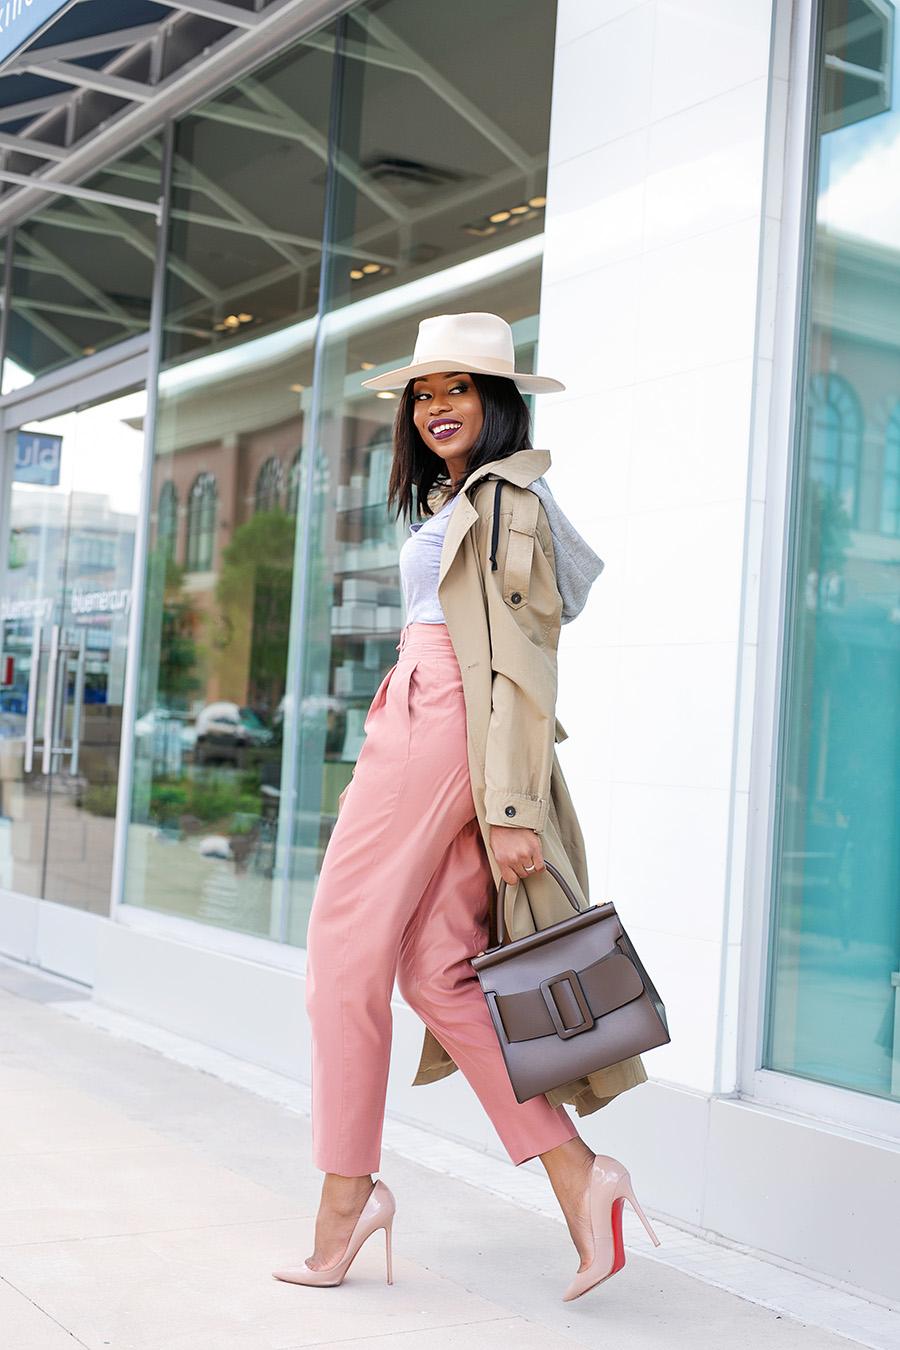 stella-adewunmi-of-jadore-fashion-shares-zara-trench-coat-wool-hat-for-fall